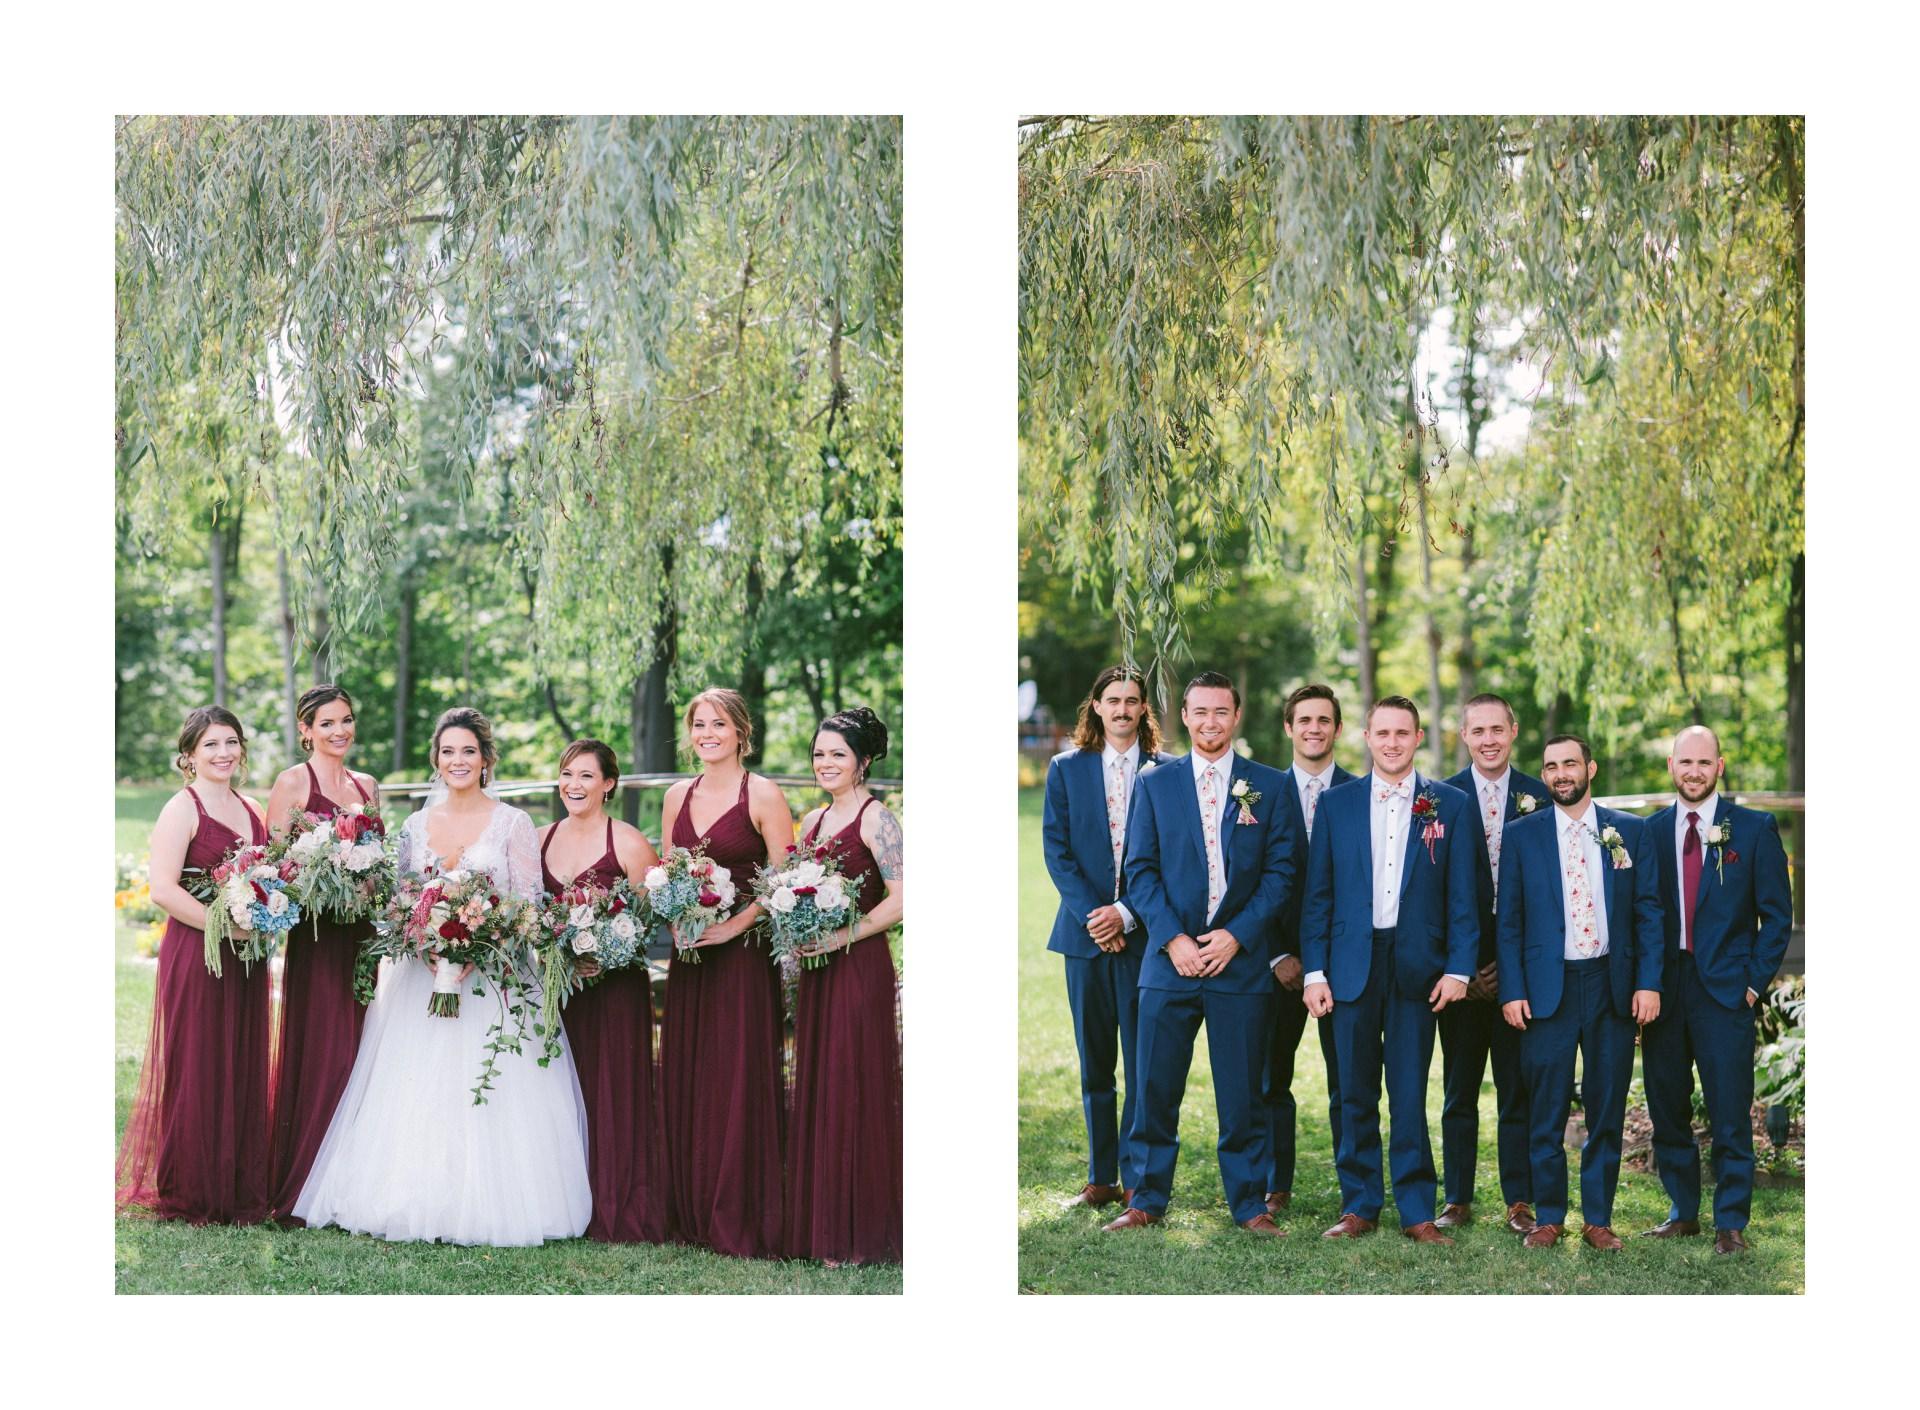 Meadow Ridge Farm Wedding Photos in Windsor 1 35.jpg